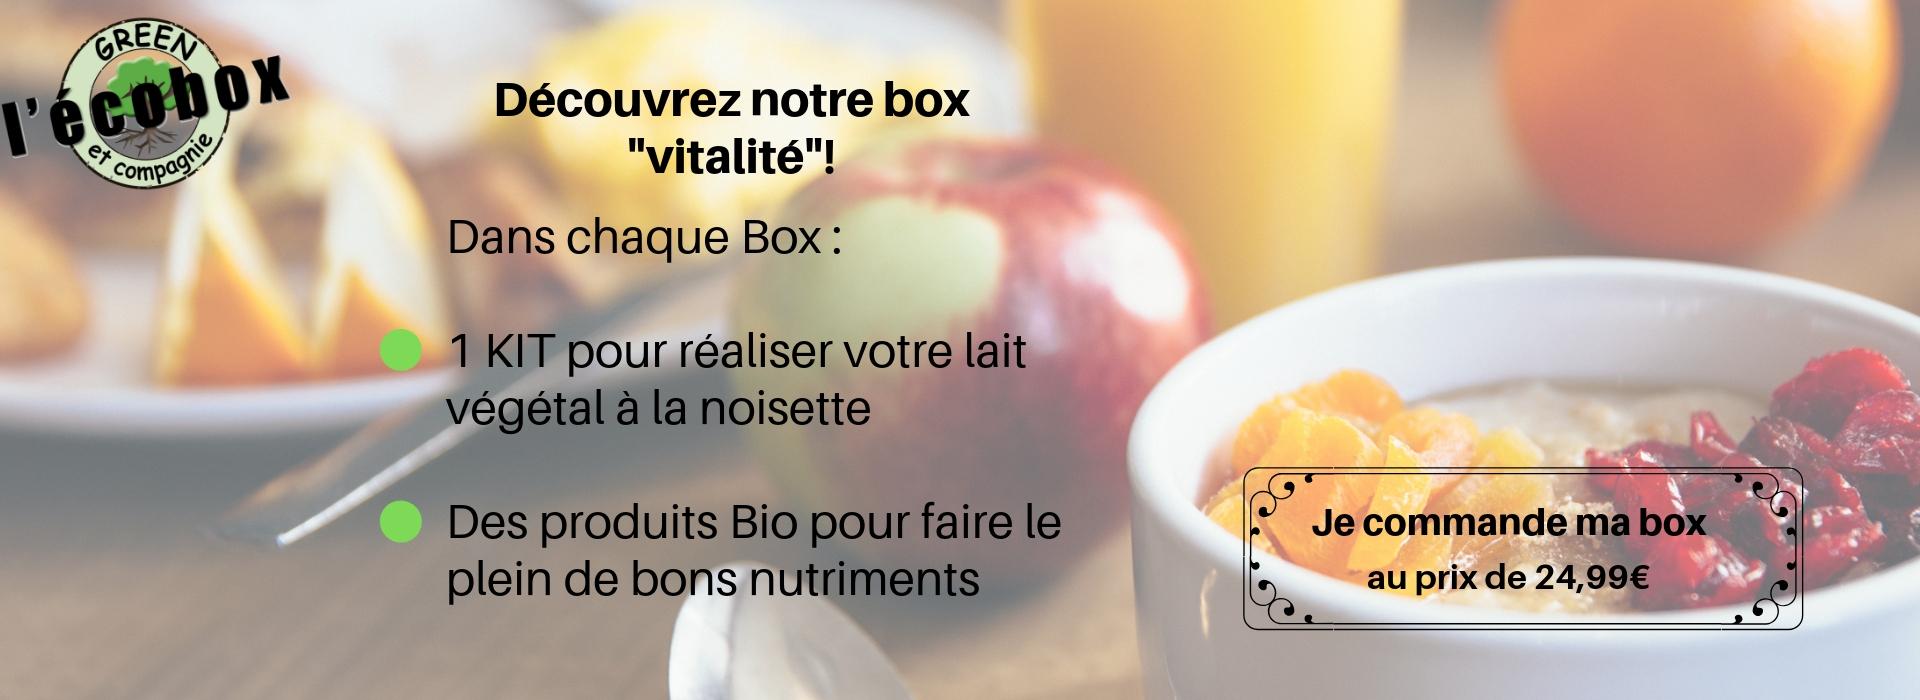 Ecobox vitalité